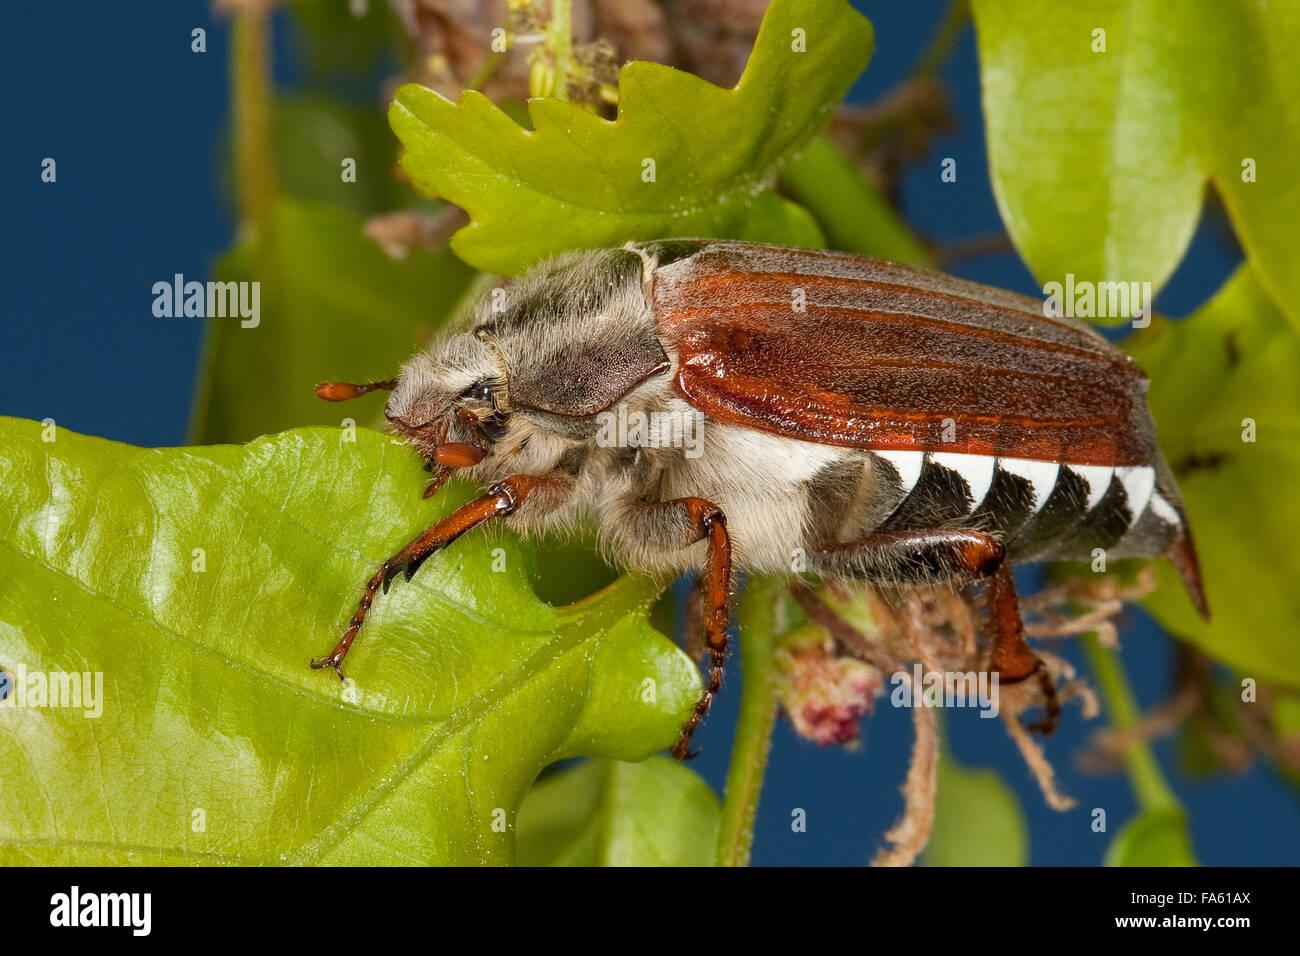 Maybeetle, may-beetle, common cockchafer, maybug, Maikäfer, Feld-Maikäfer, Feldmaikäfer, Mai-Käfer, Melolontha melolontha Stock Photo